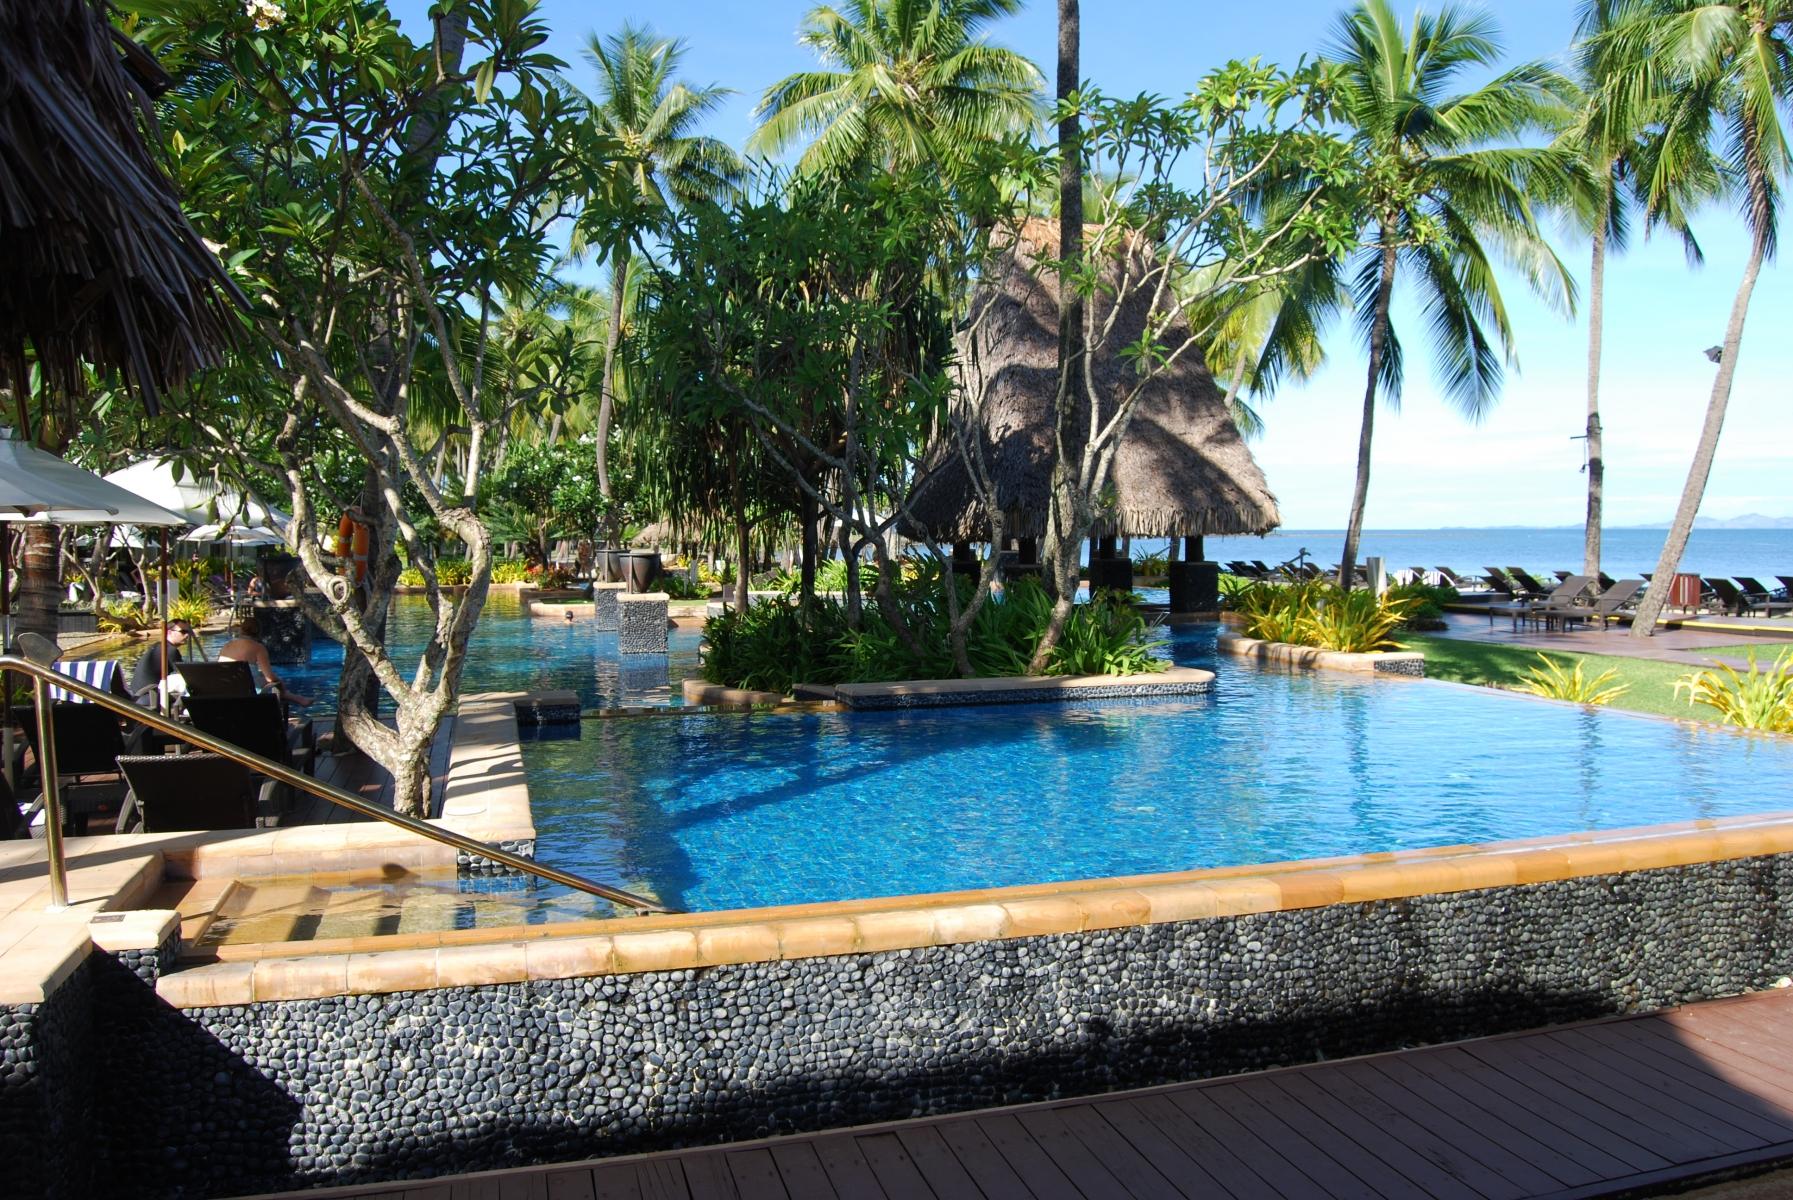 Westin-Denarau-Island-Resort-Fiji-1-30-2011-4-23-16-PM